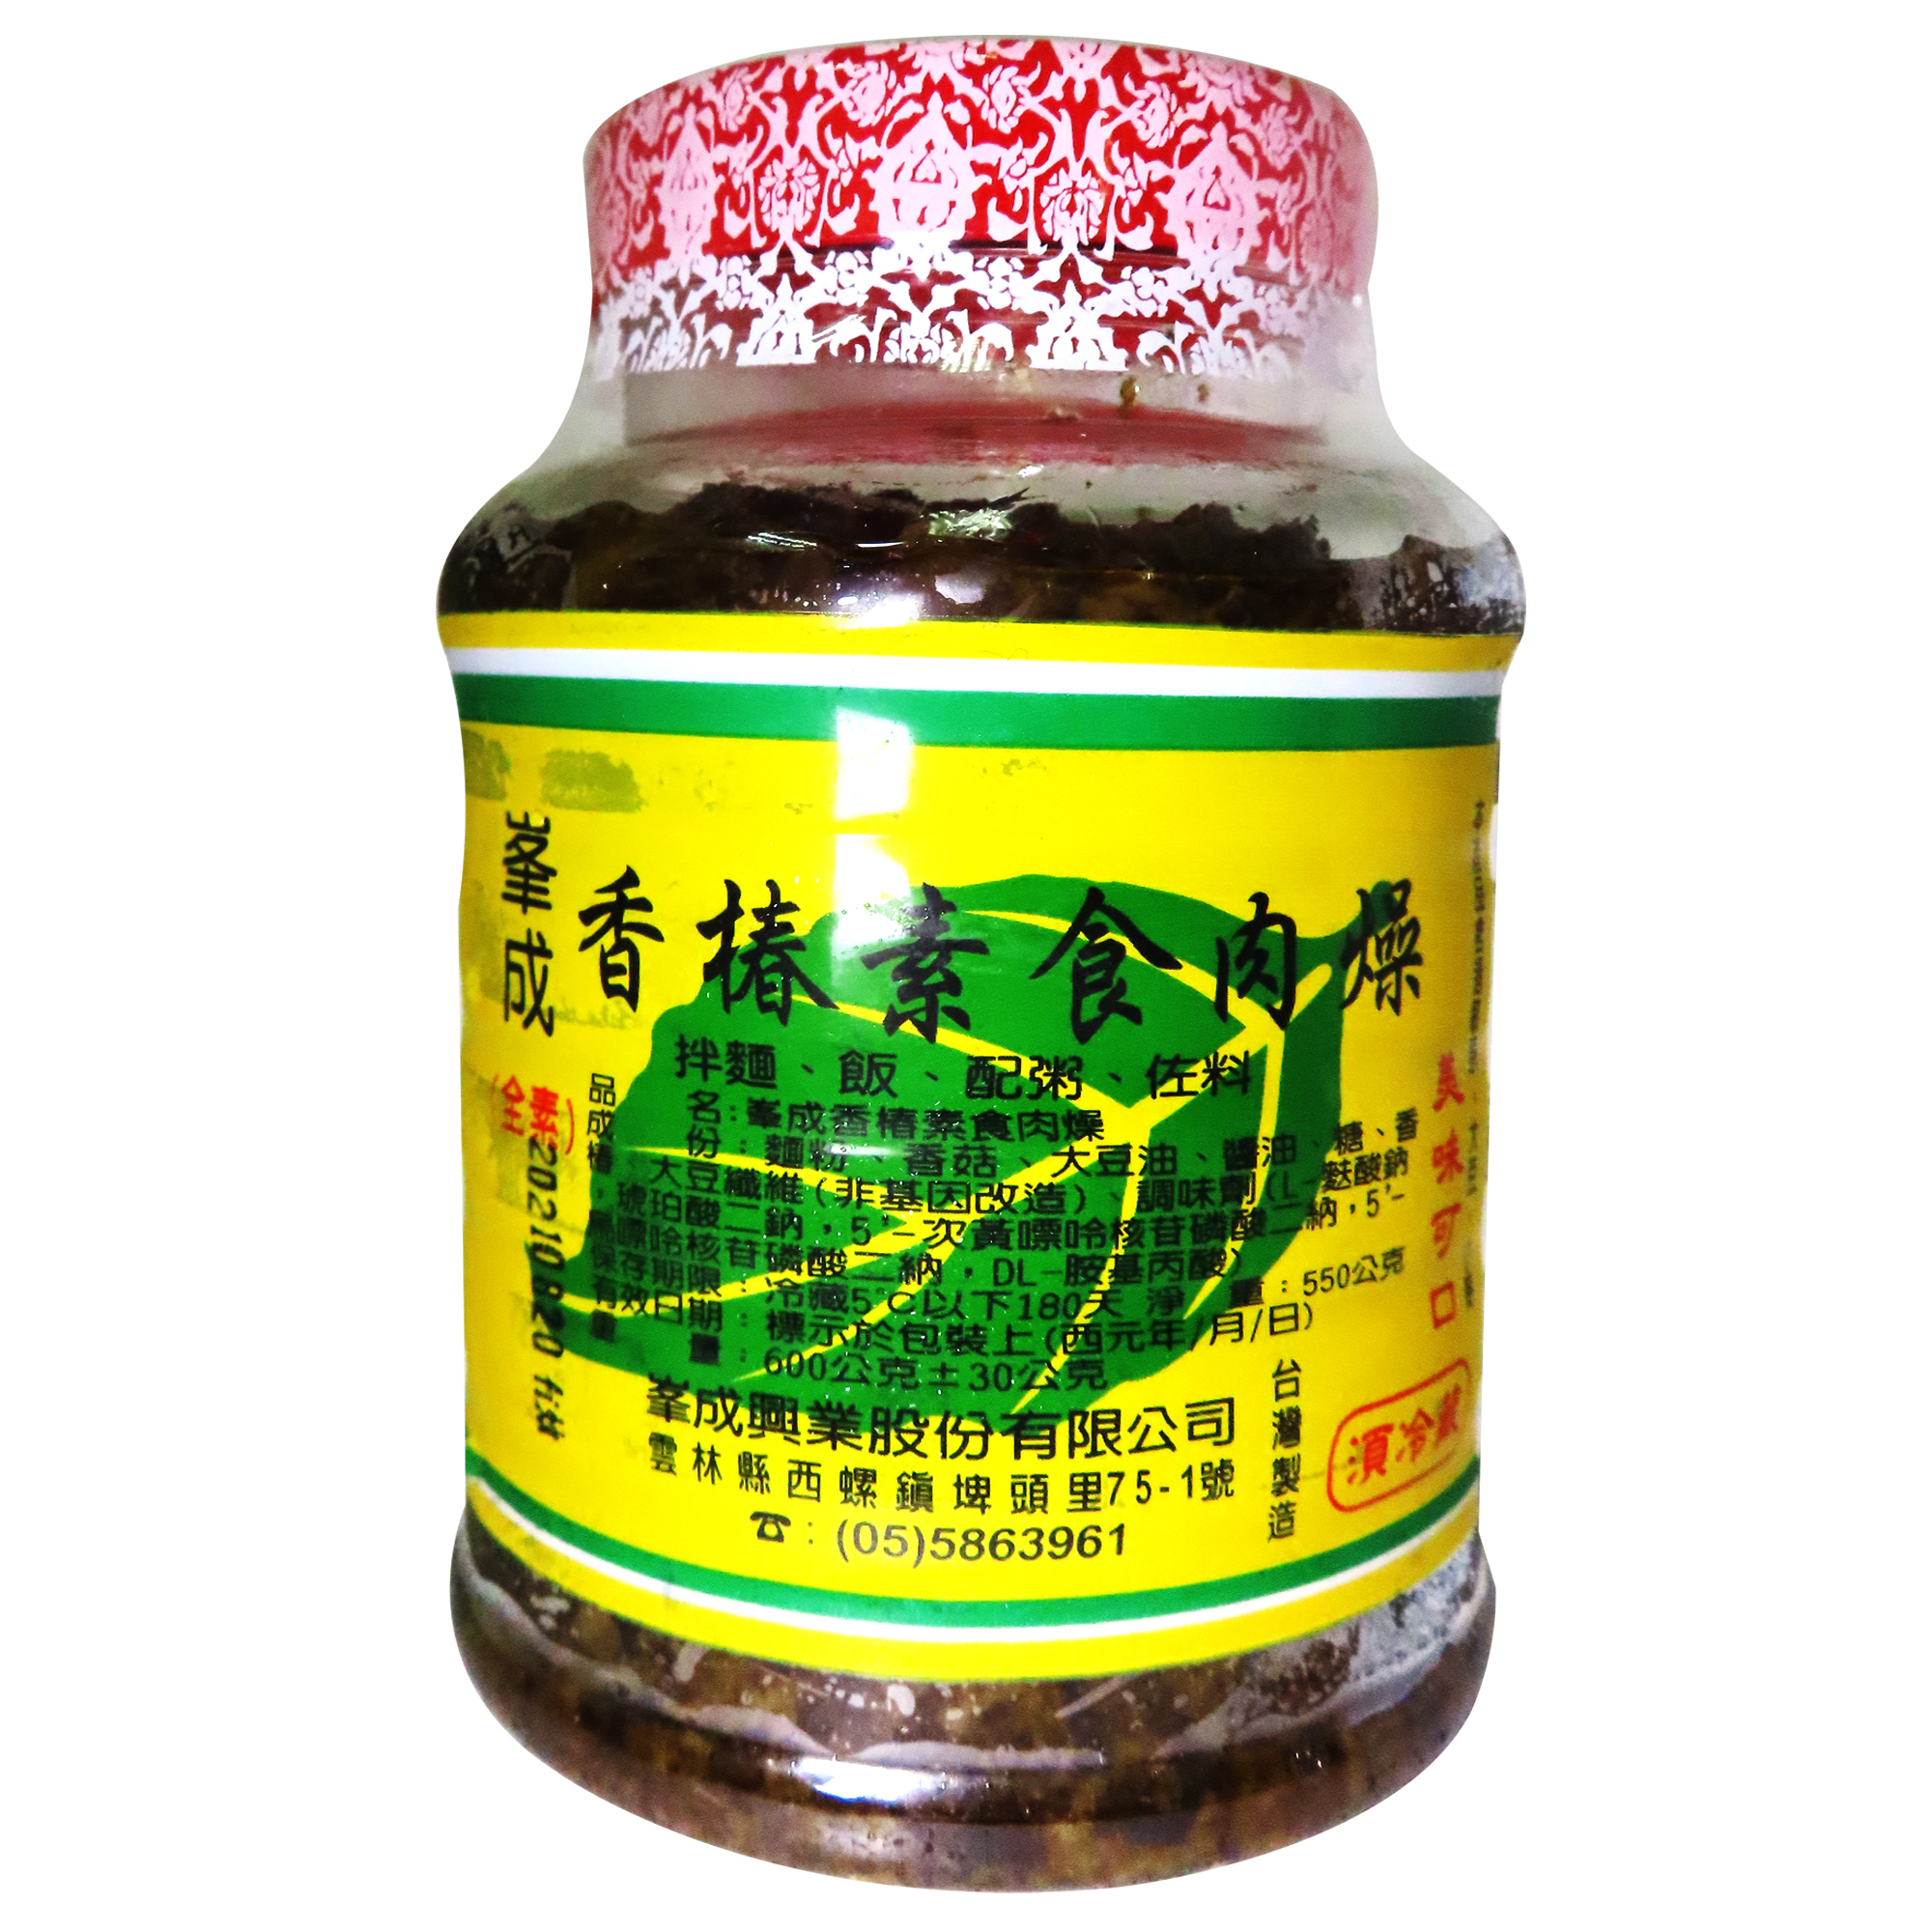 Image Cedar Minced Mushroom Rou Zao峯成 - 香椿肉燥 600grams